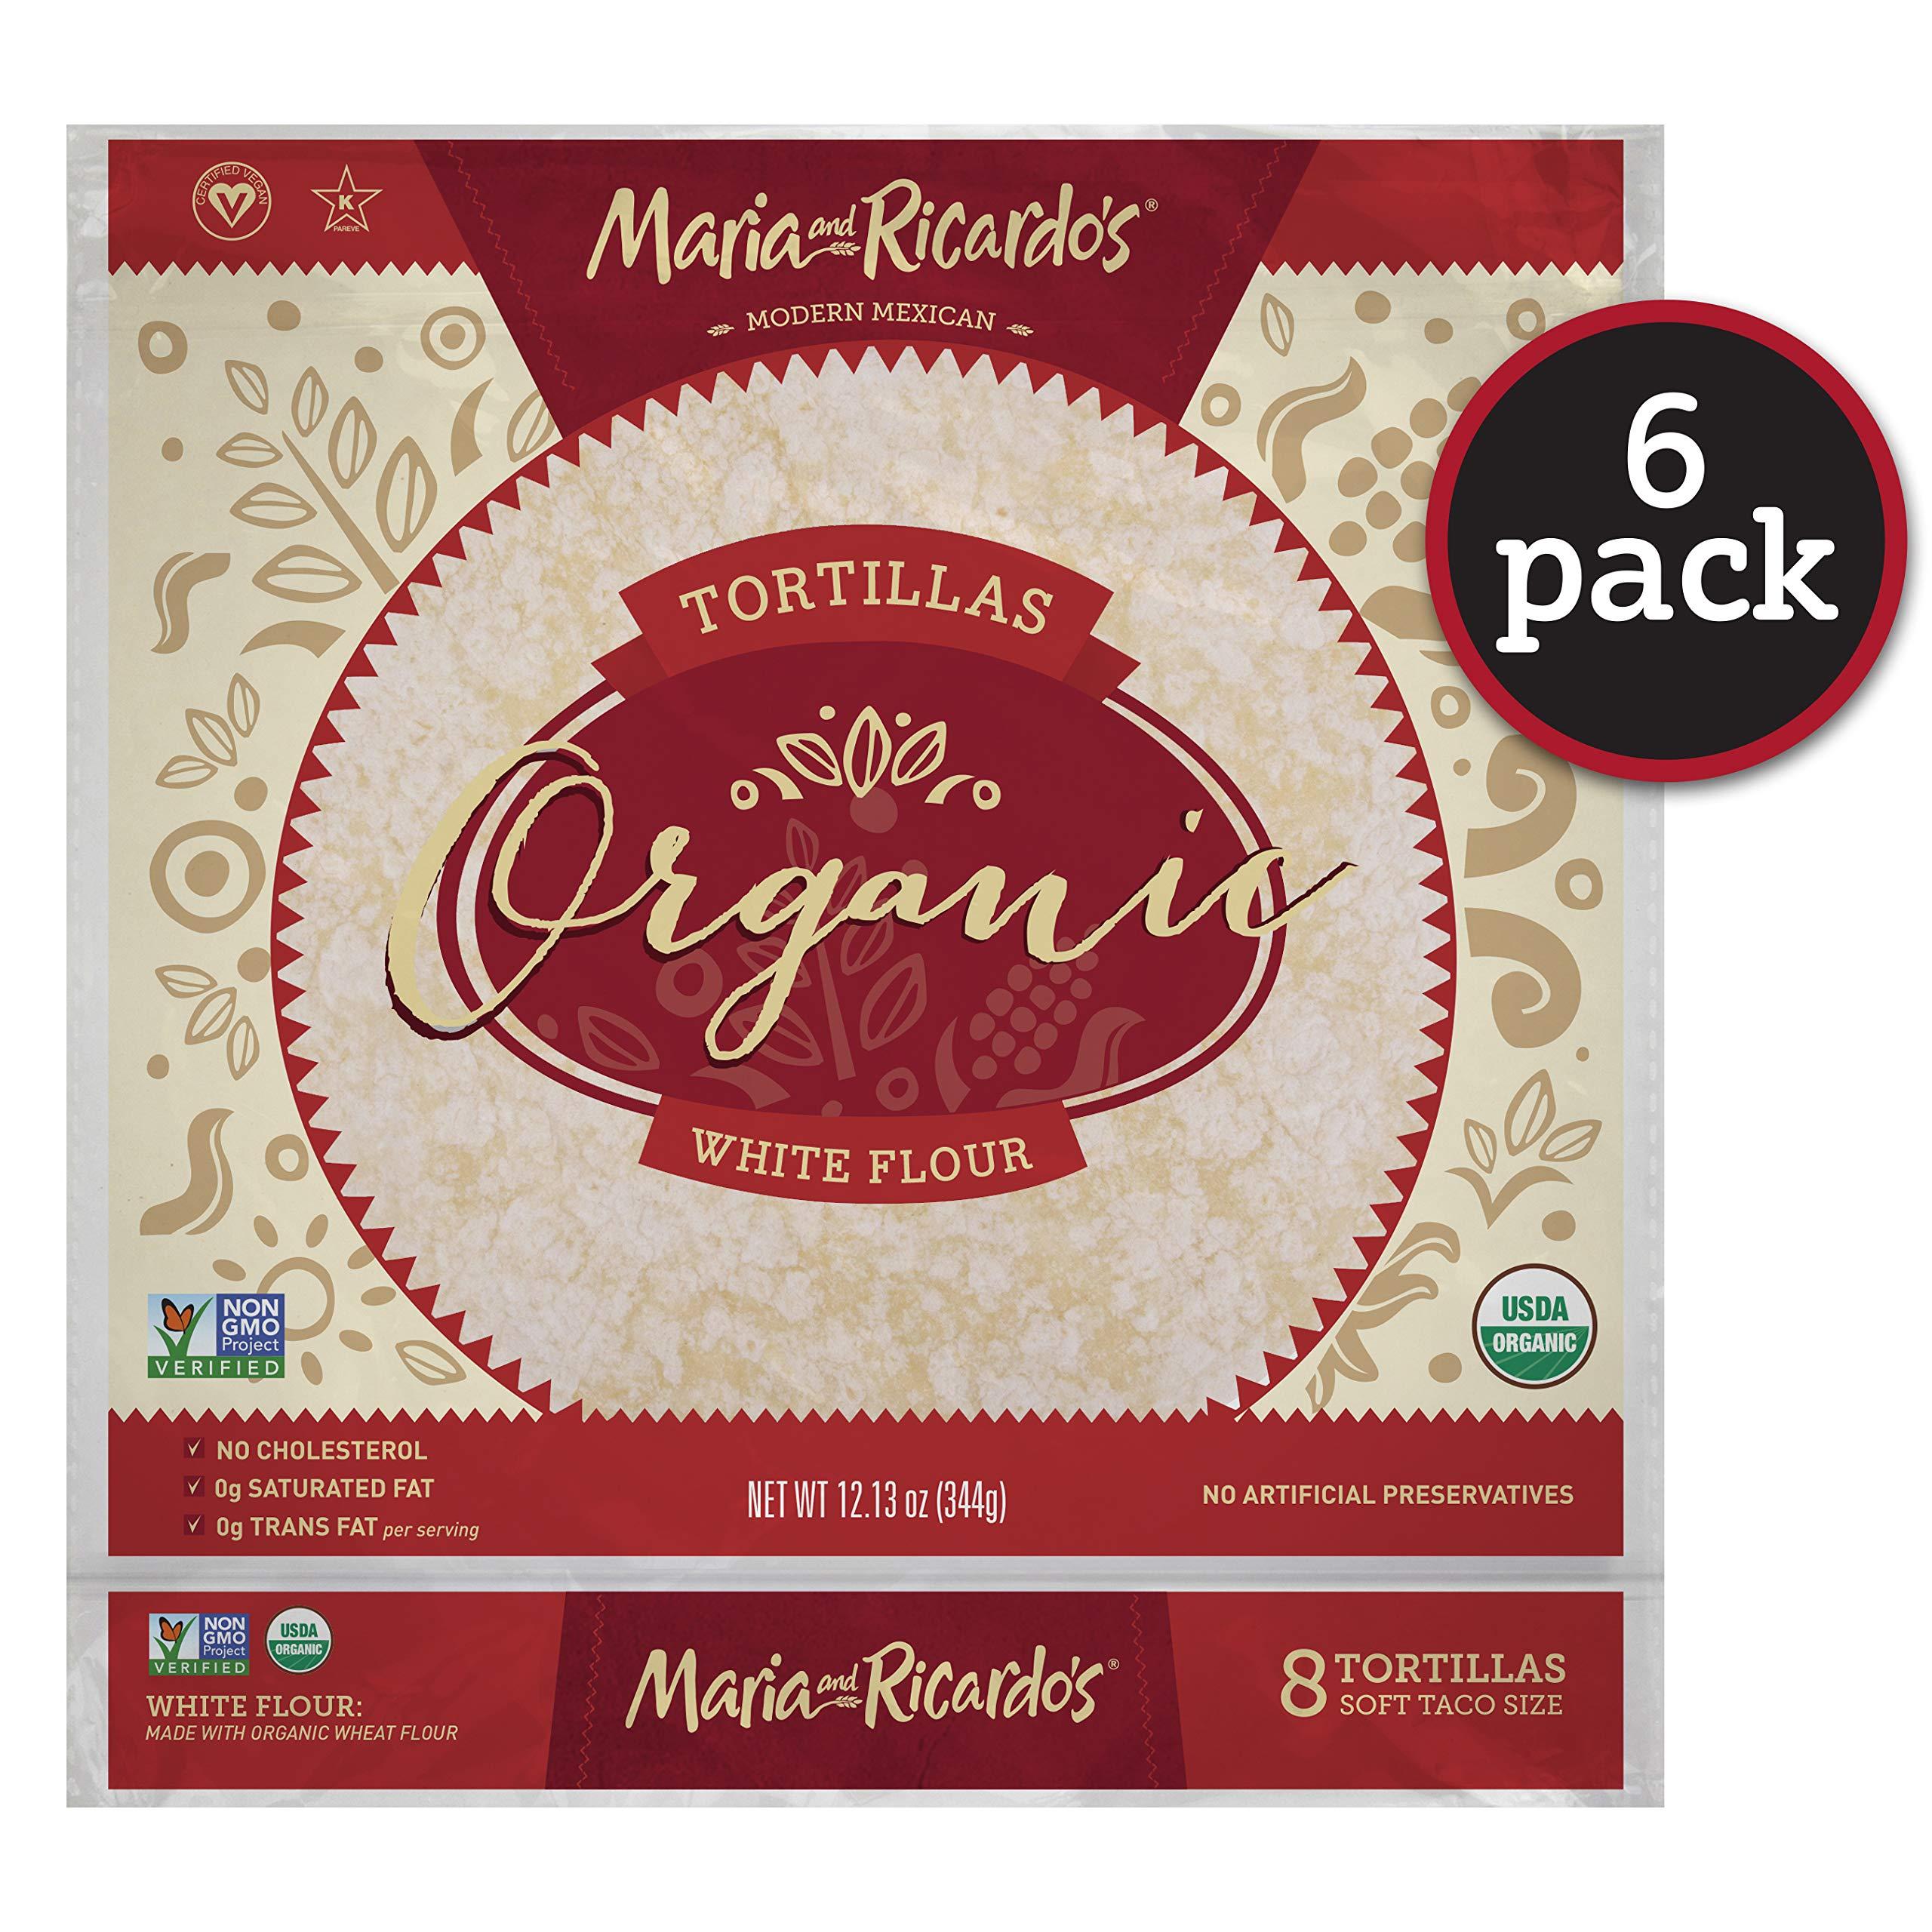 Maria & Ricardo's Organic White Flour Tortillas. (6 Pack) USDA Certified Organic, Non GMO PV, Vegan, Kosher. 8 Tortillas per Pack